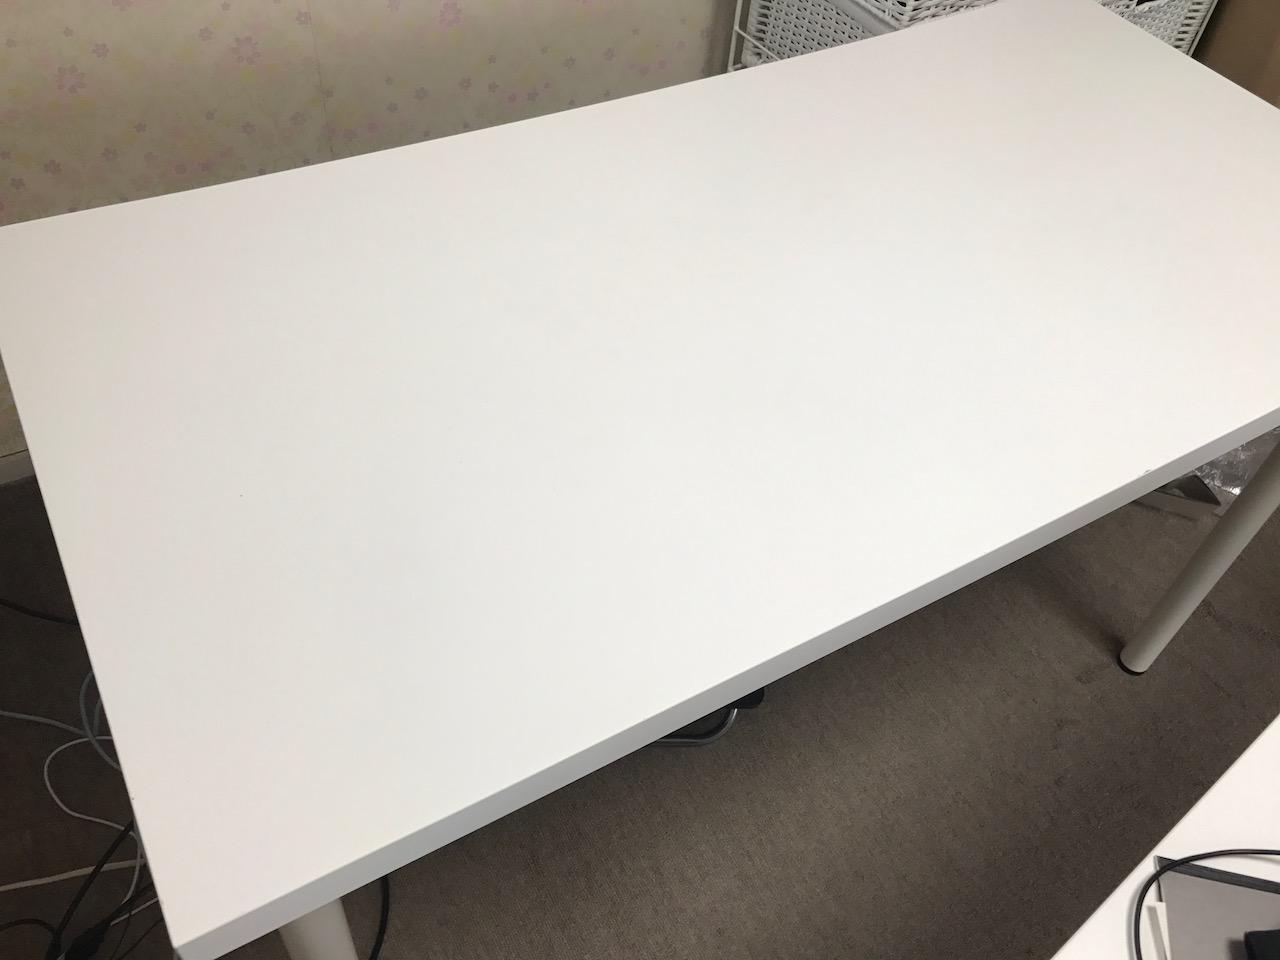 IKEAのスタンディングデスクがオススメできる理由!高さは?体への効果がすごい